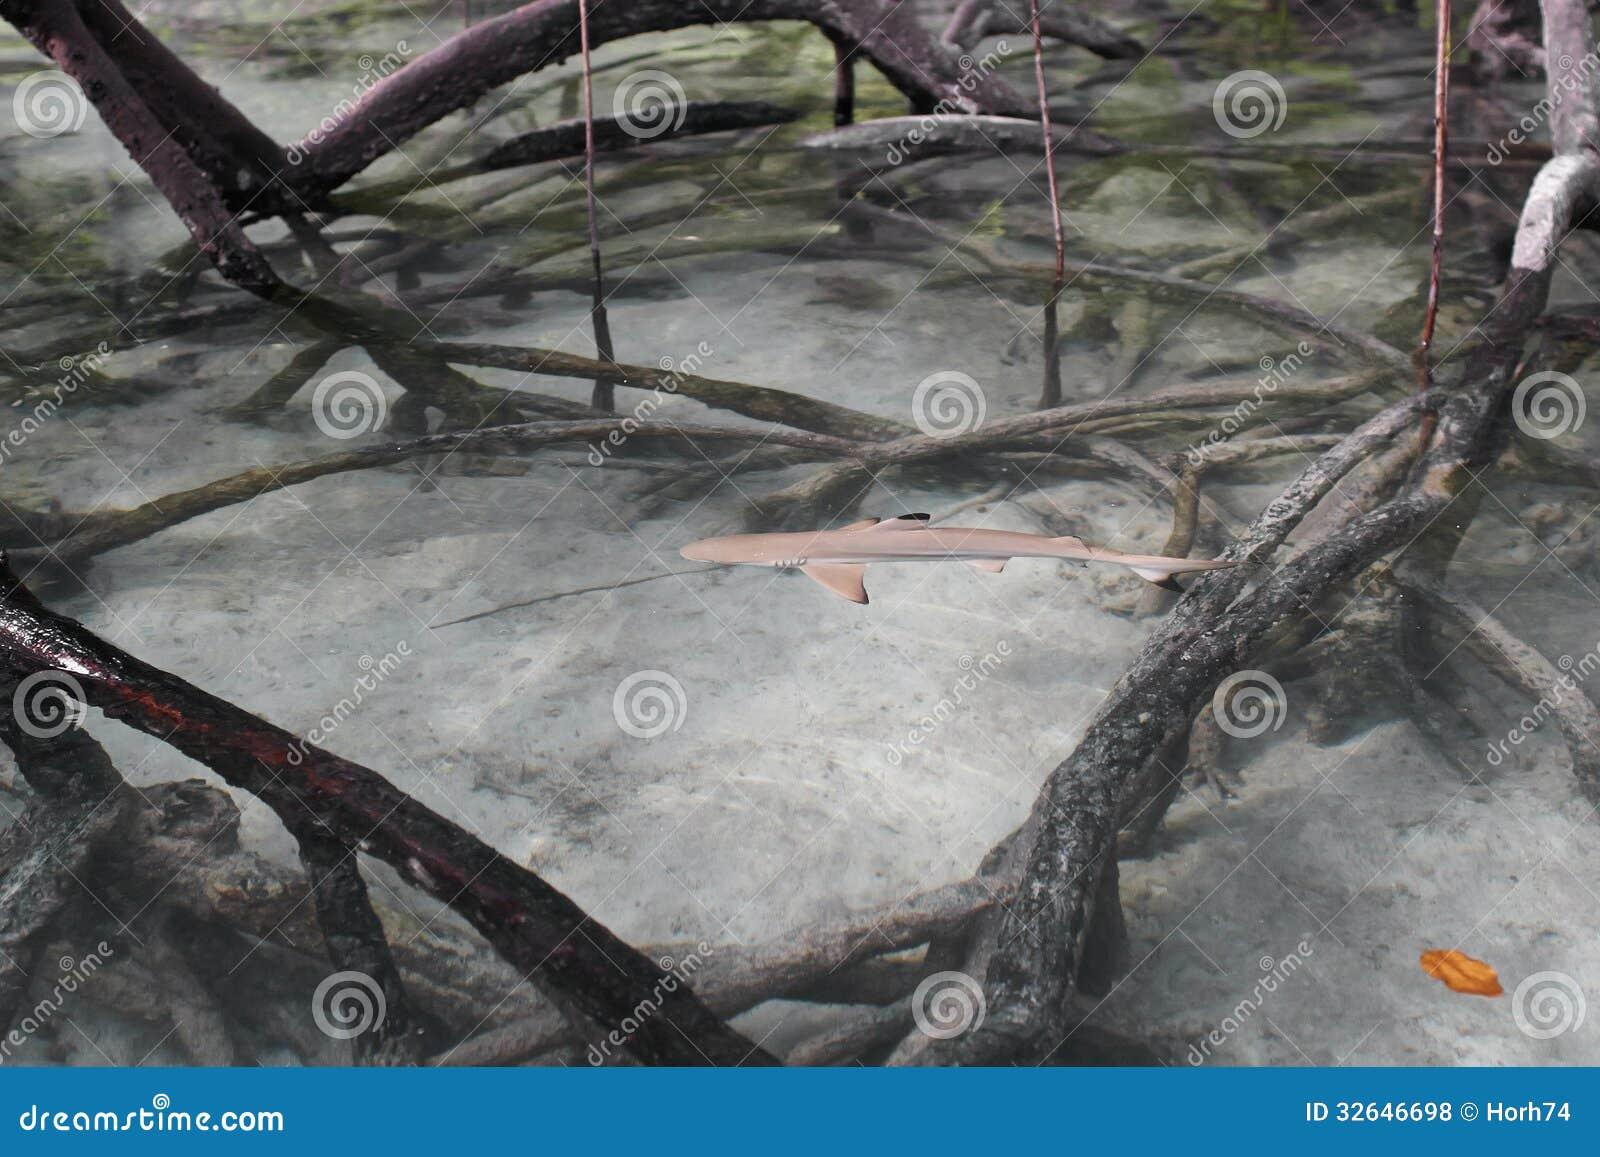 Porada rafowy rekin w mangrowe.